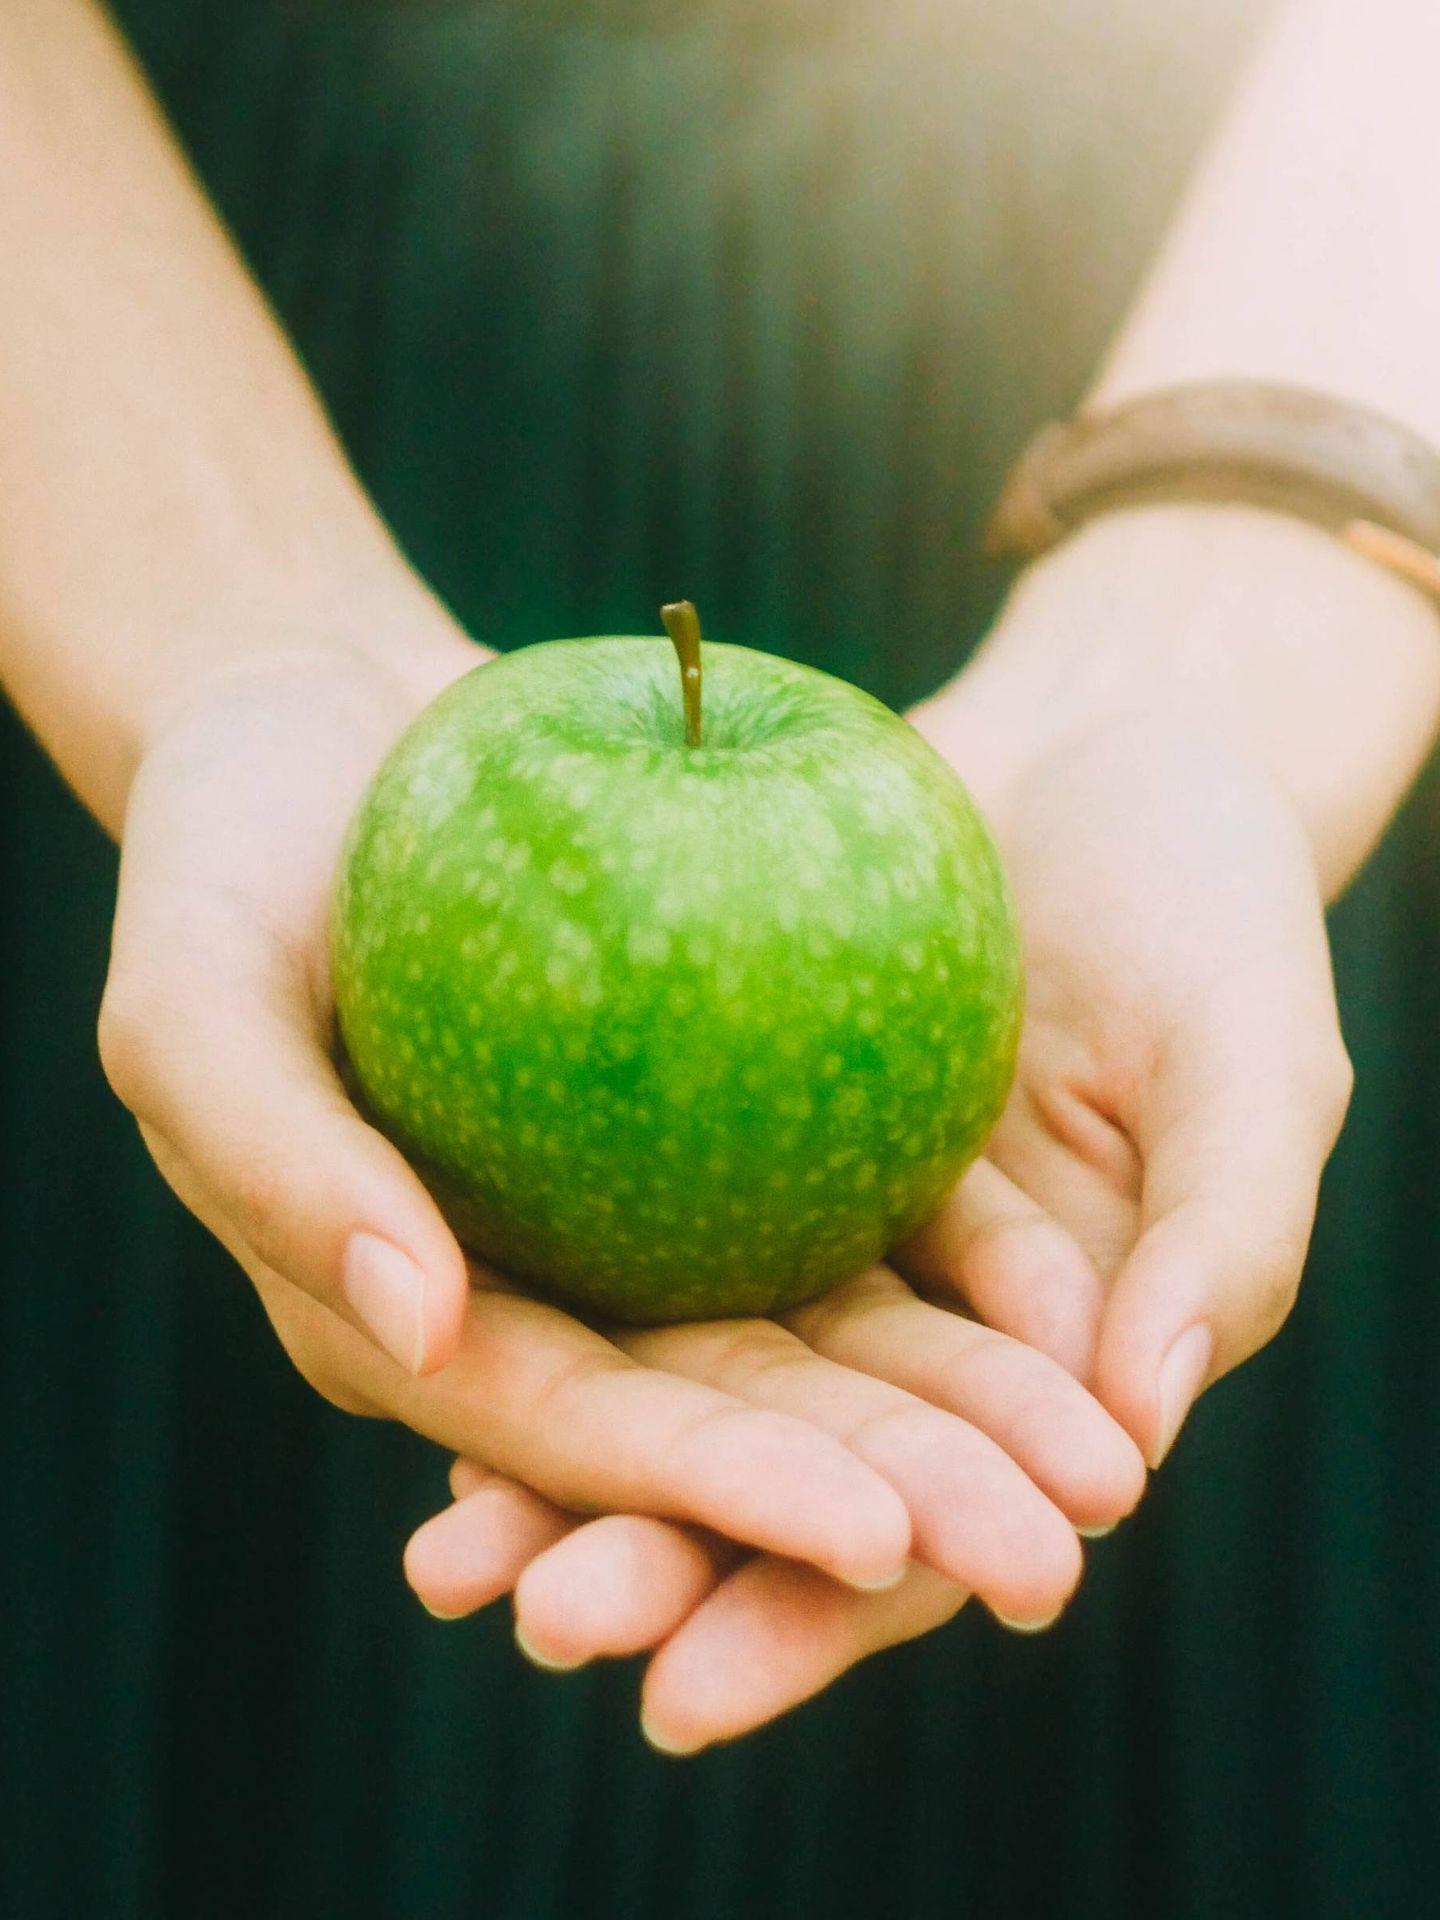 Manzanas, estupendas en tu dieta para adelgazar. (Jony Ariadi para Unsplash)